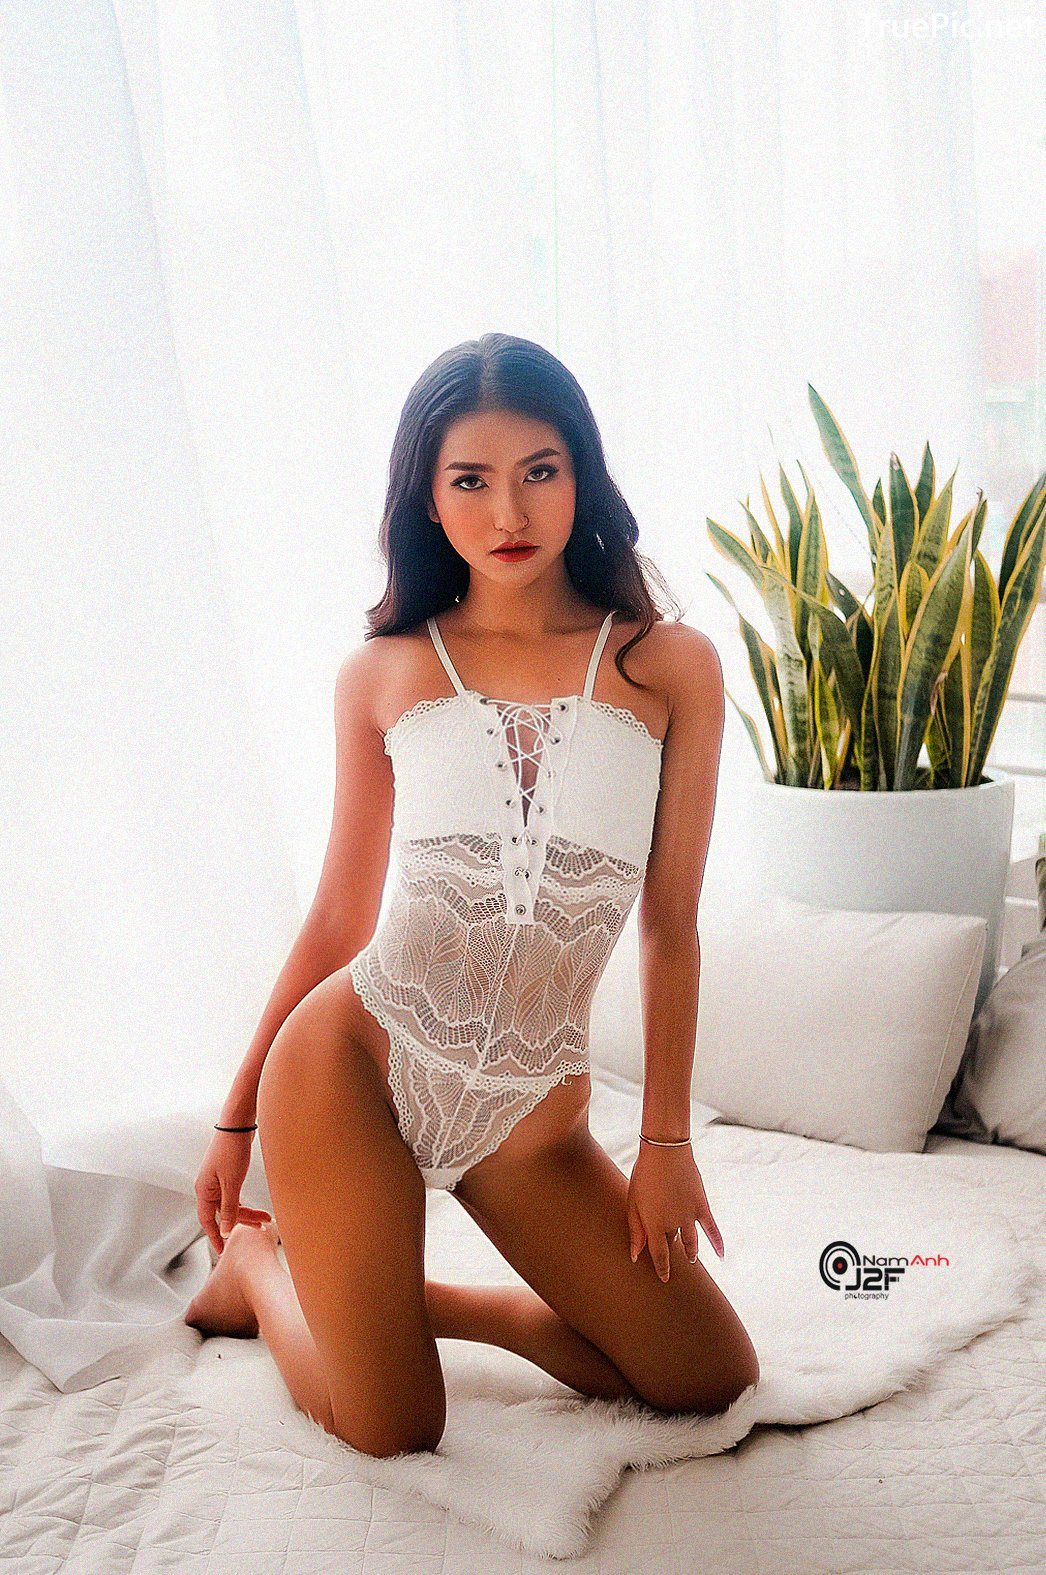 Image Vietnamese Model – Sexy Beauty of Beautiful Girls Taken by NamAnh Photo #7 - TruePic.net - Picture-43